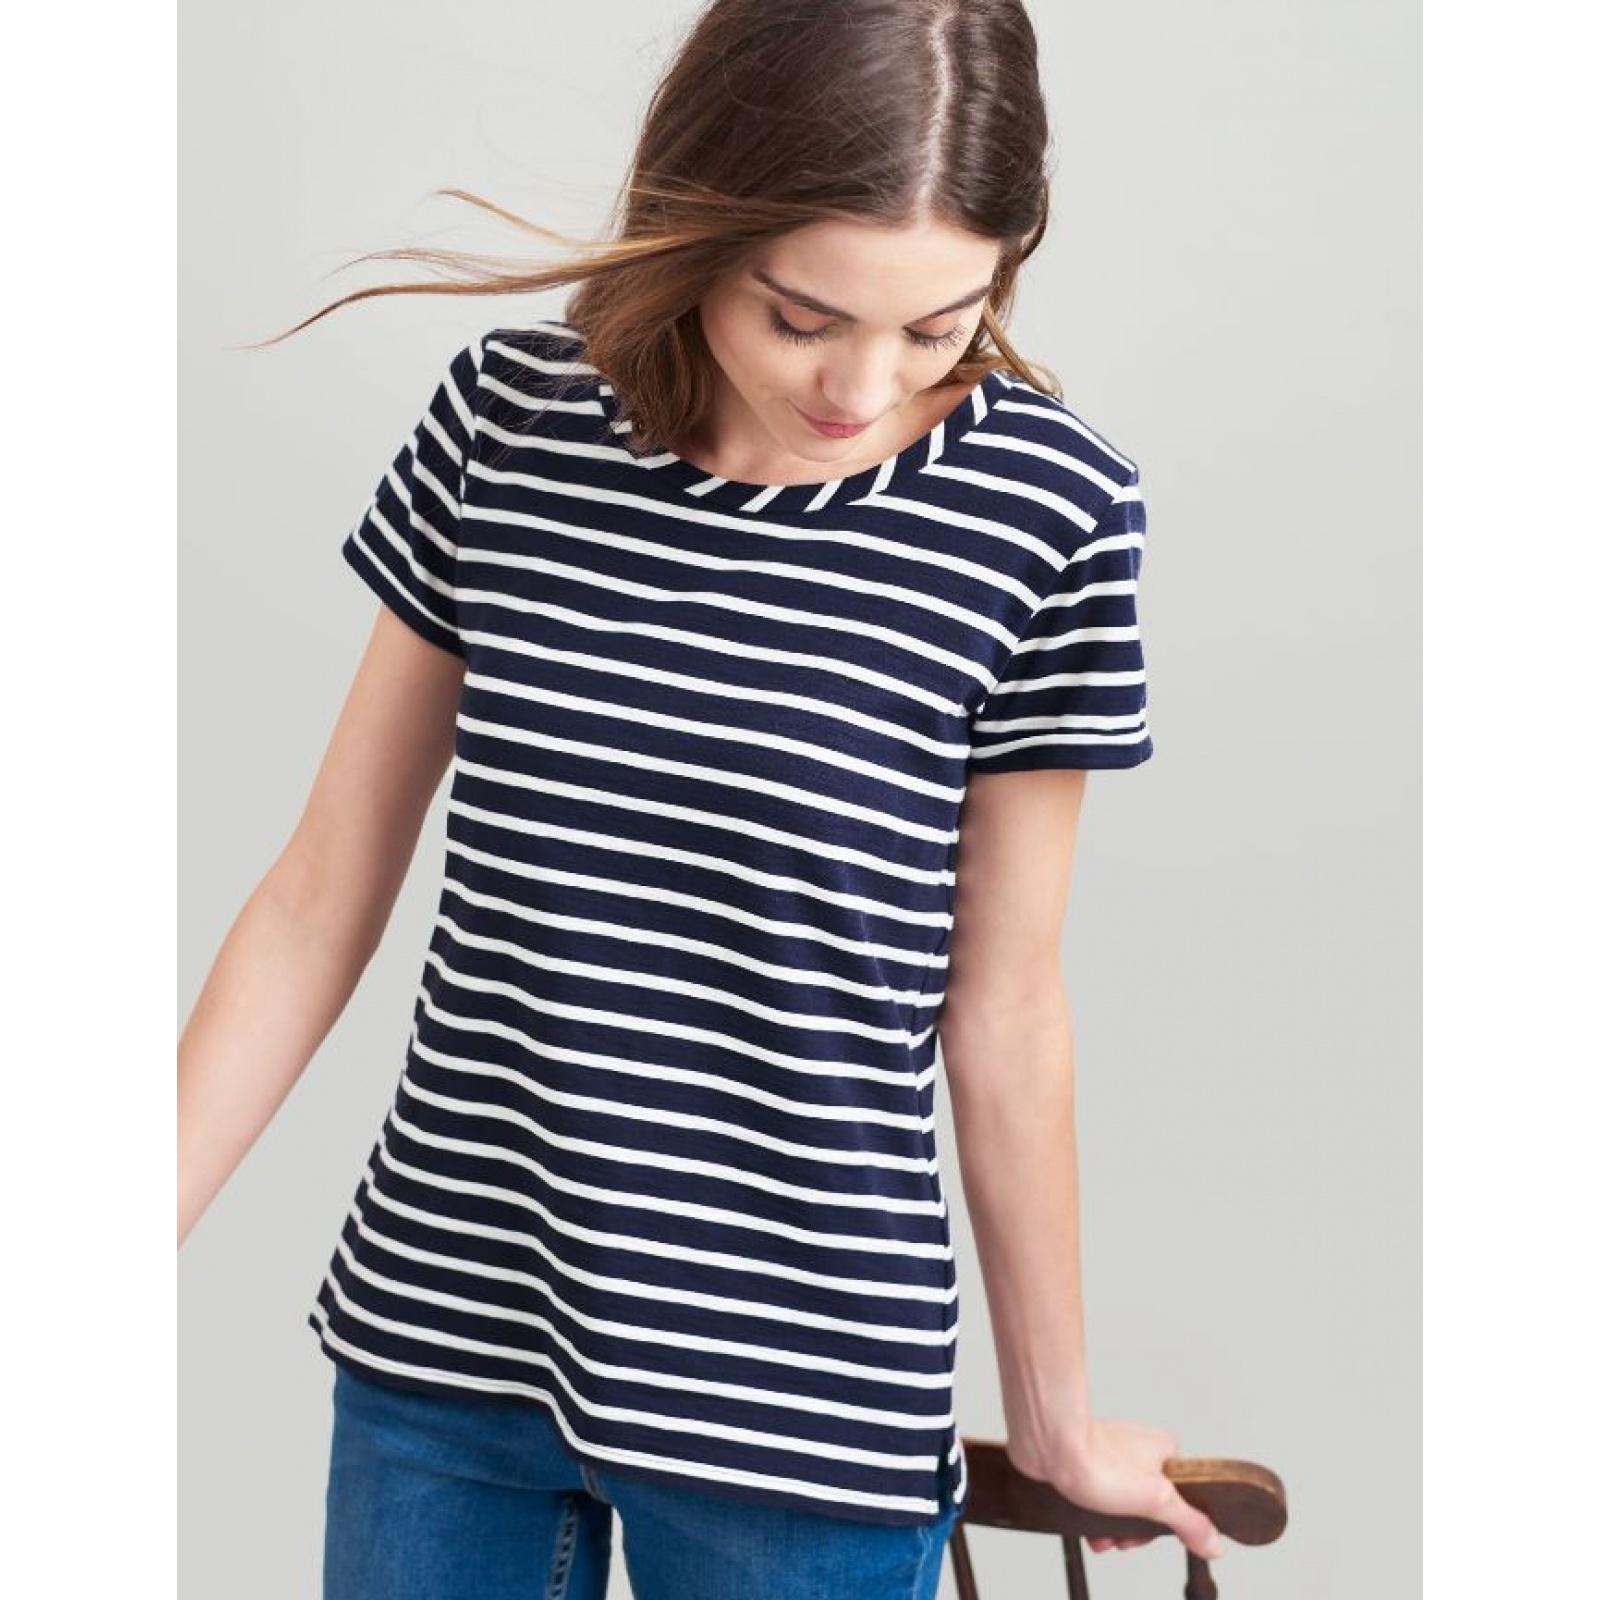 Joules-Nessa-Raya-Ligero-Jersey-Camiseta-SS19 miniatura 20